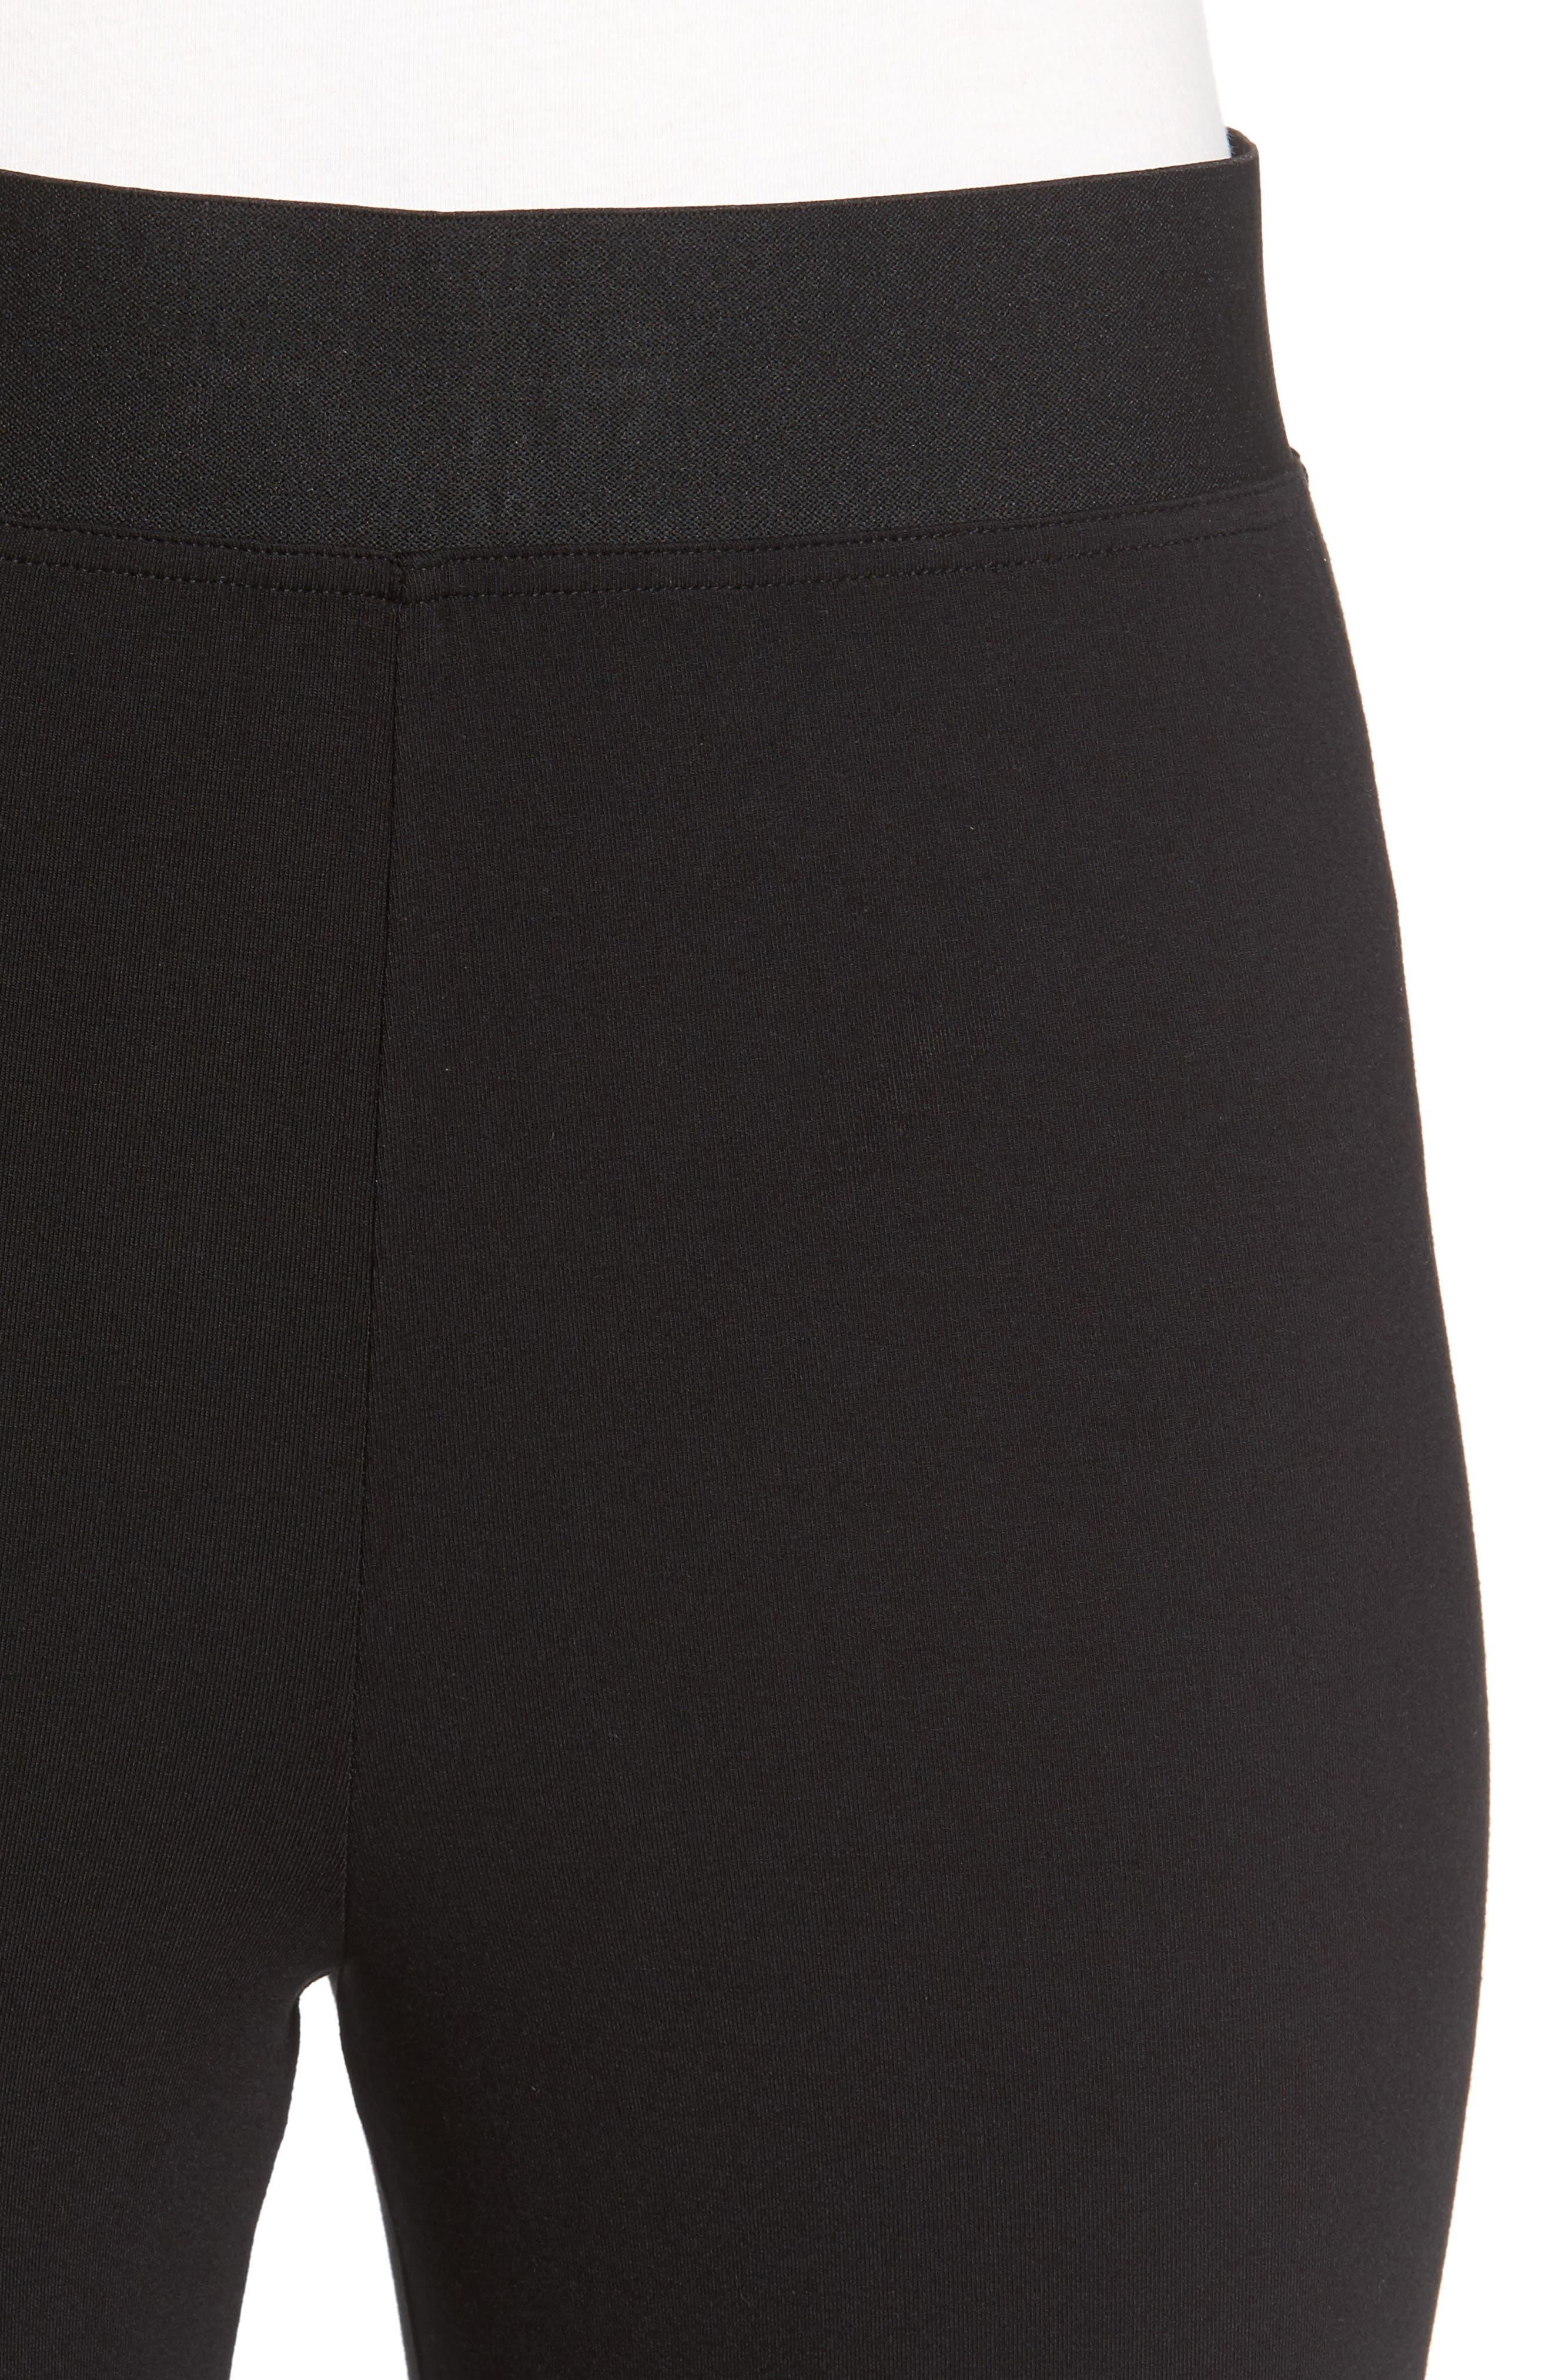 Grommet Detail Skinny Knit Pants,                             Alternate thumbnail 4, color,                             001